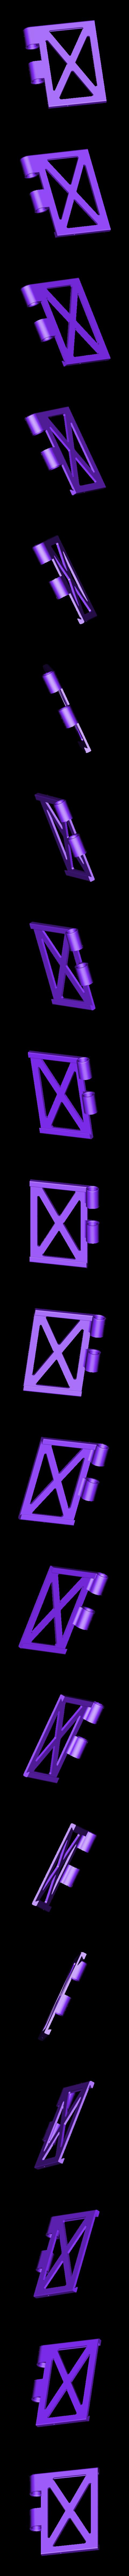 Part1x1.STL Download free STL file Recipe book / iPad / tablet holder • Design to 3D print, poorveshmistry